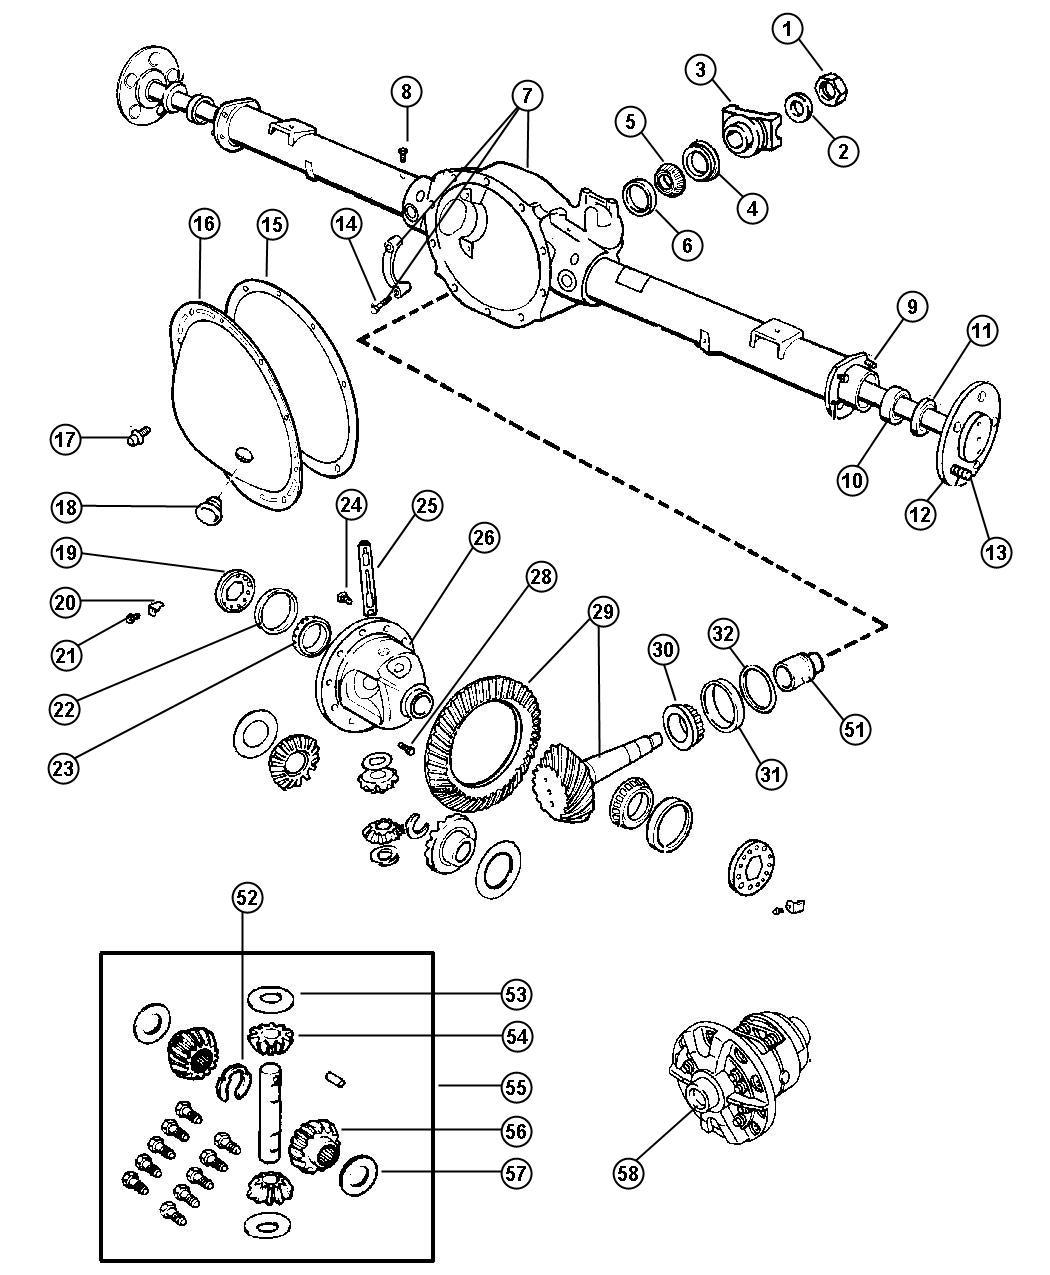 2000 Blazer Differential Parts. Diagrams. Wiring Diagram